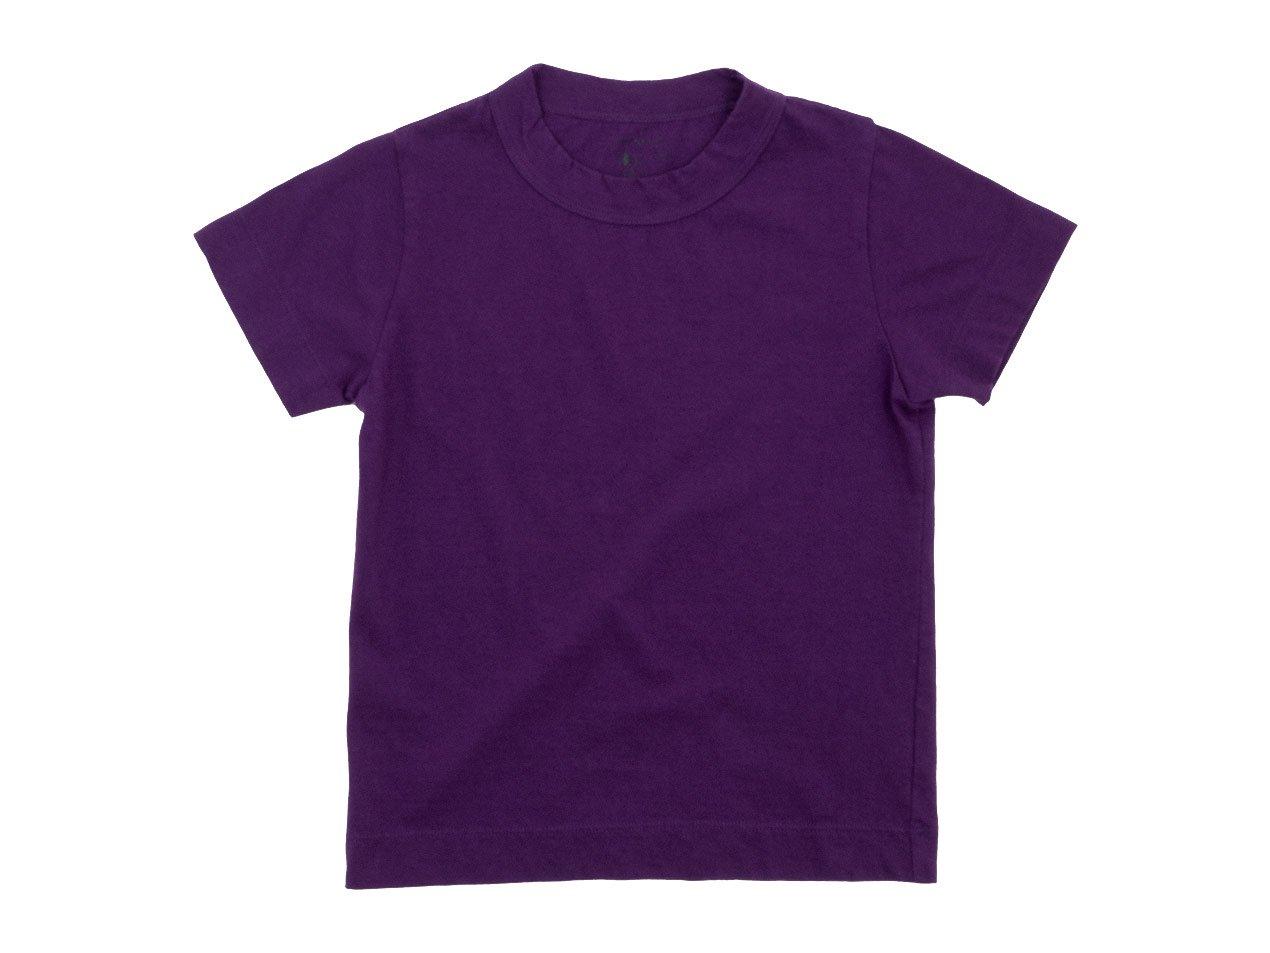 【Kid's】 homspun 30/1天竺 半袖Tシャツ パープル